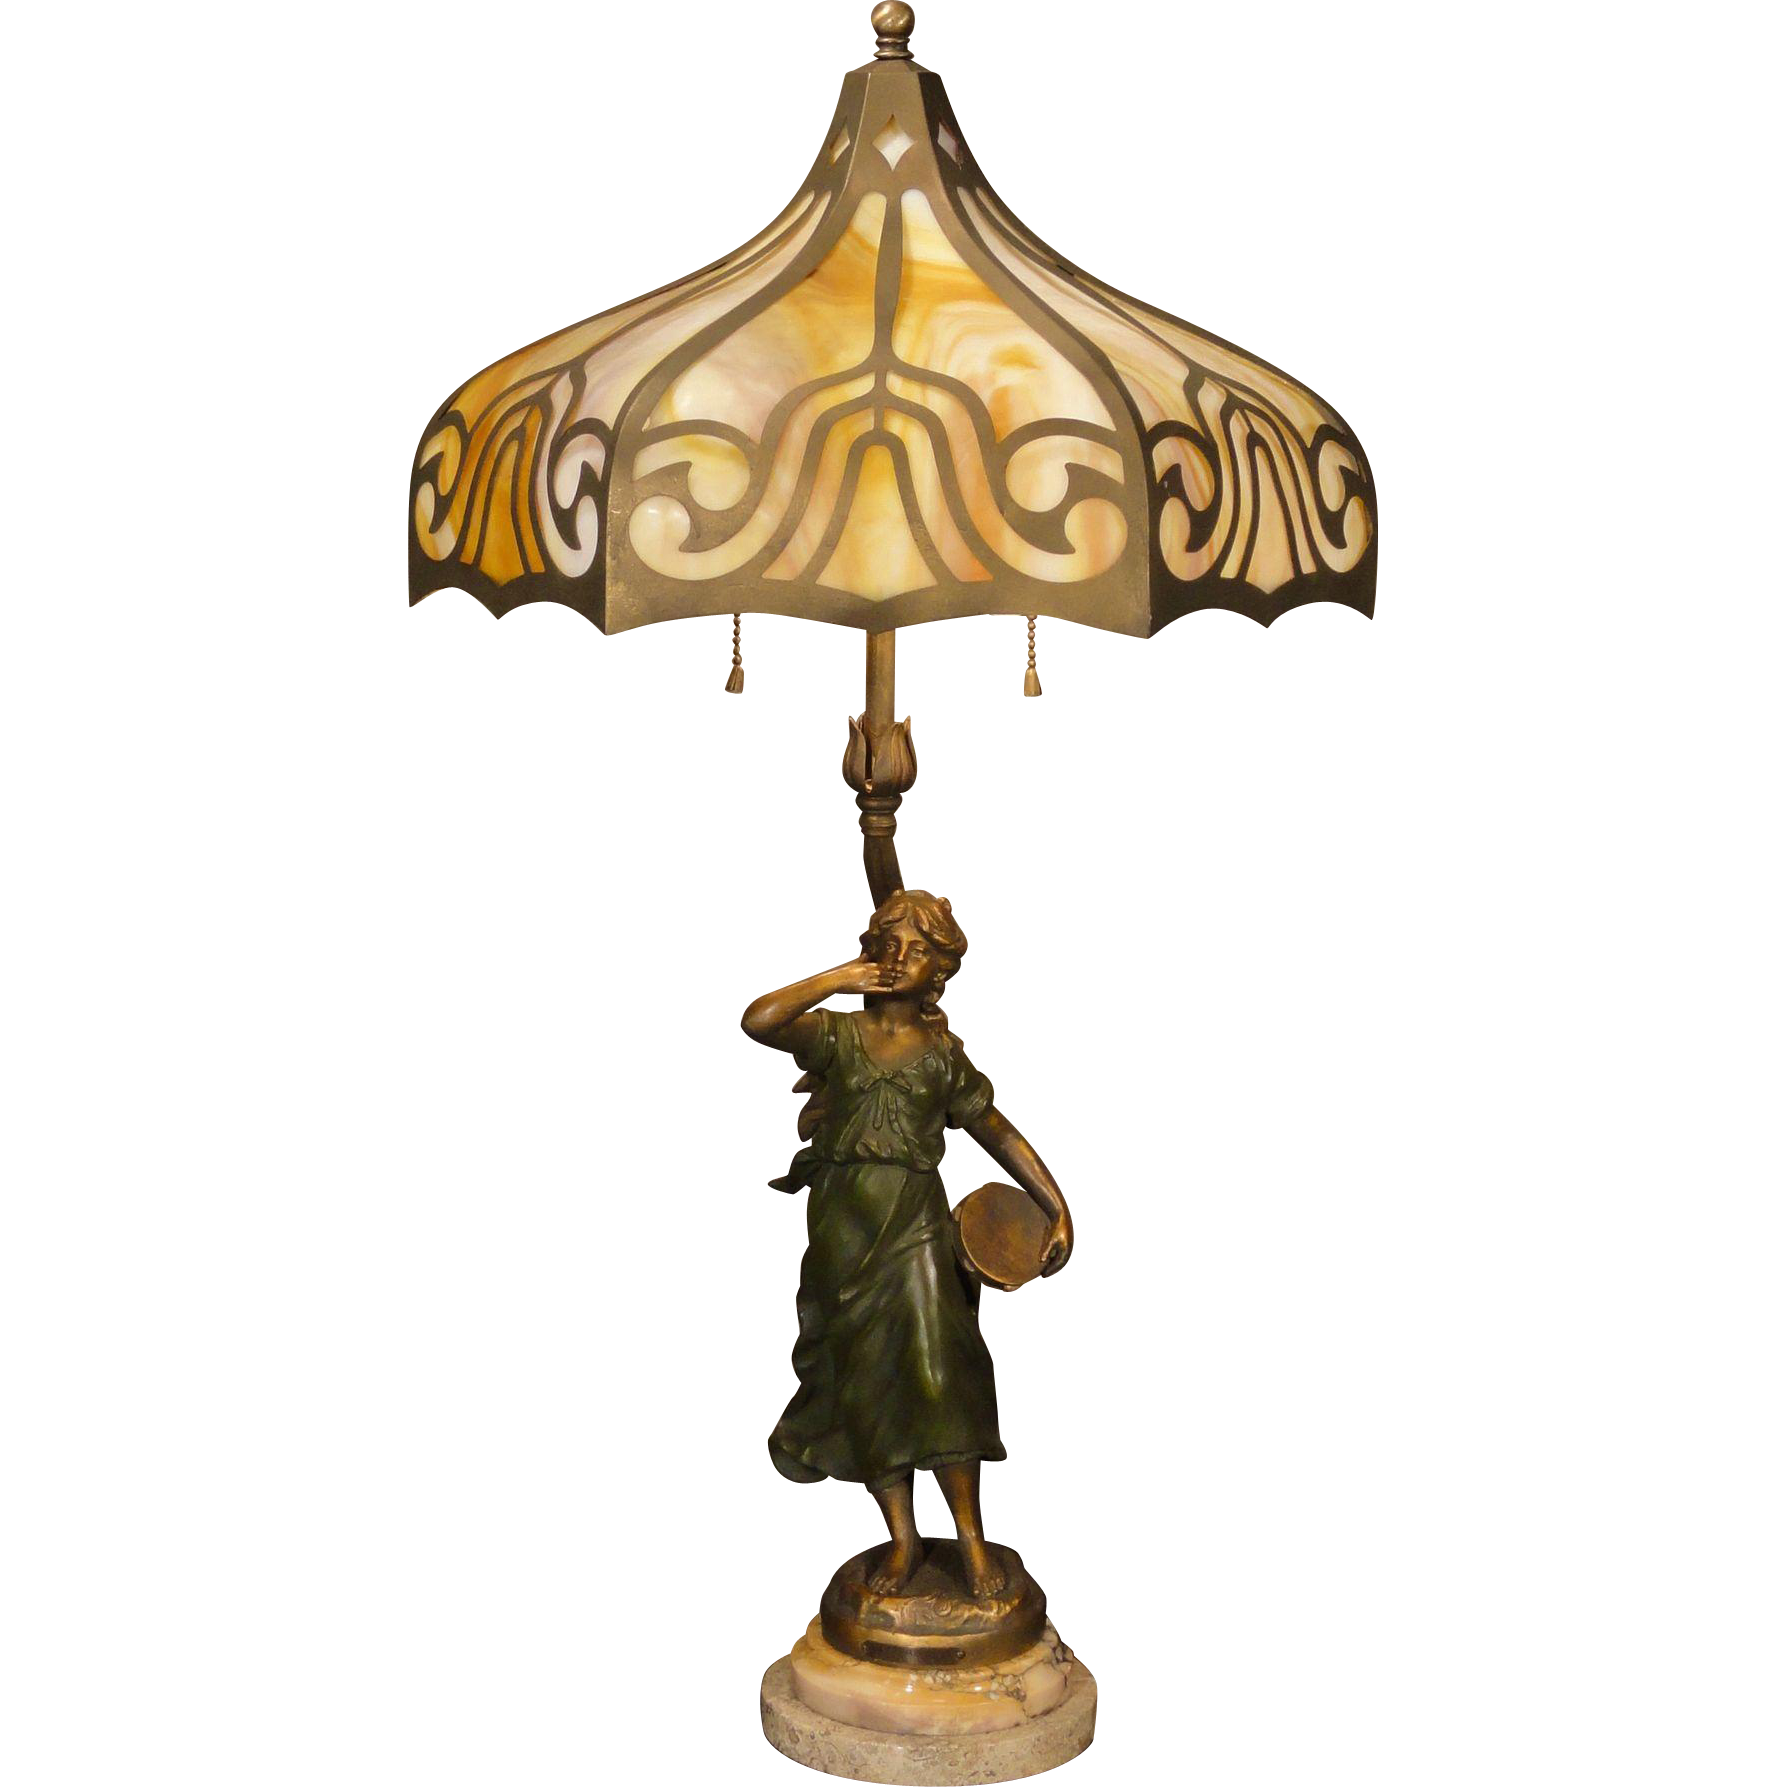 Tall, Lovely Moreau Art Nouveau Tambourine Lady w/ Slag Glass Cut Brass Shade